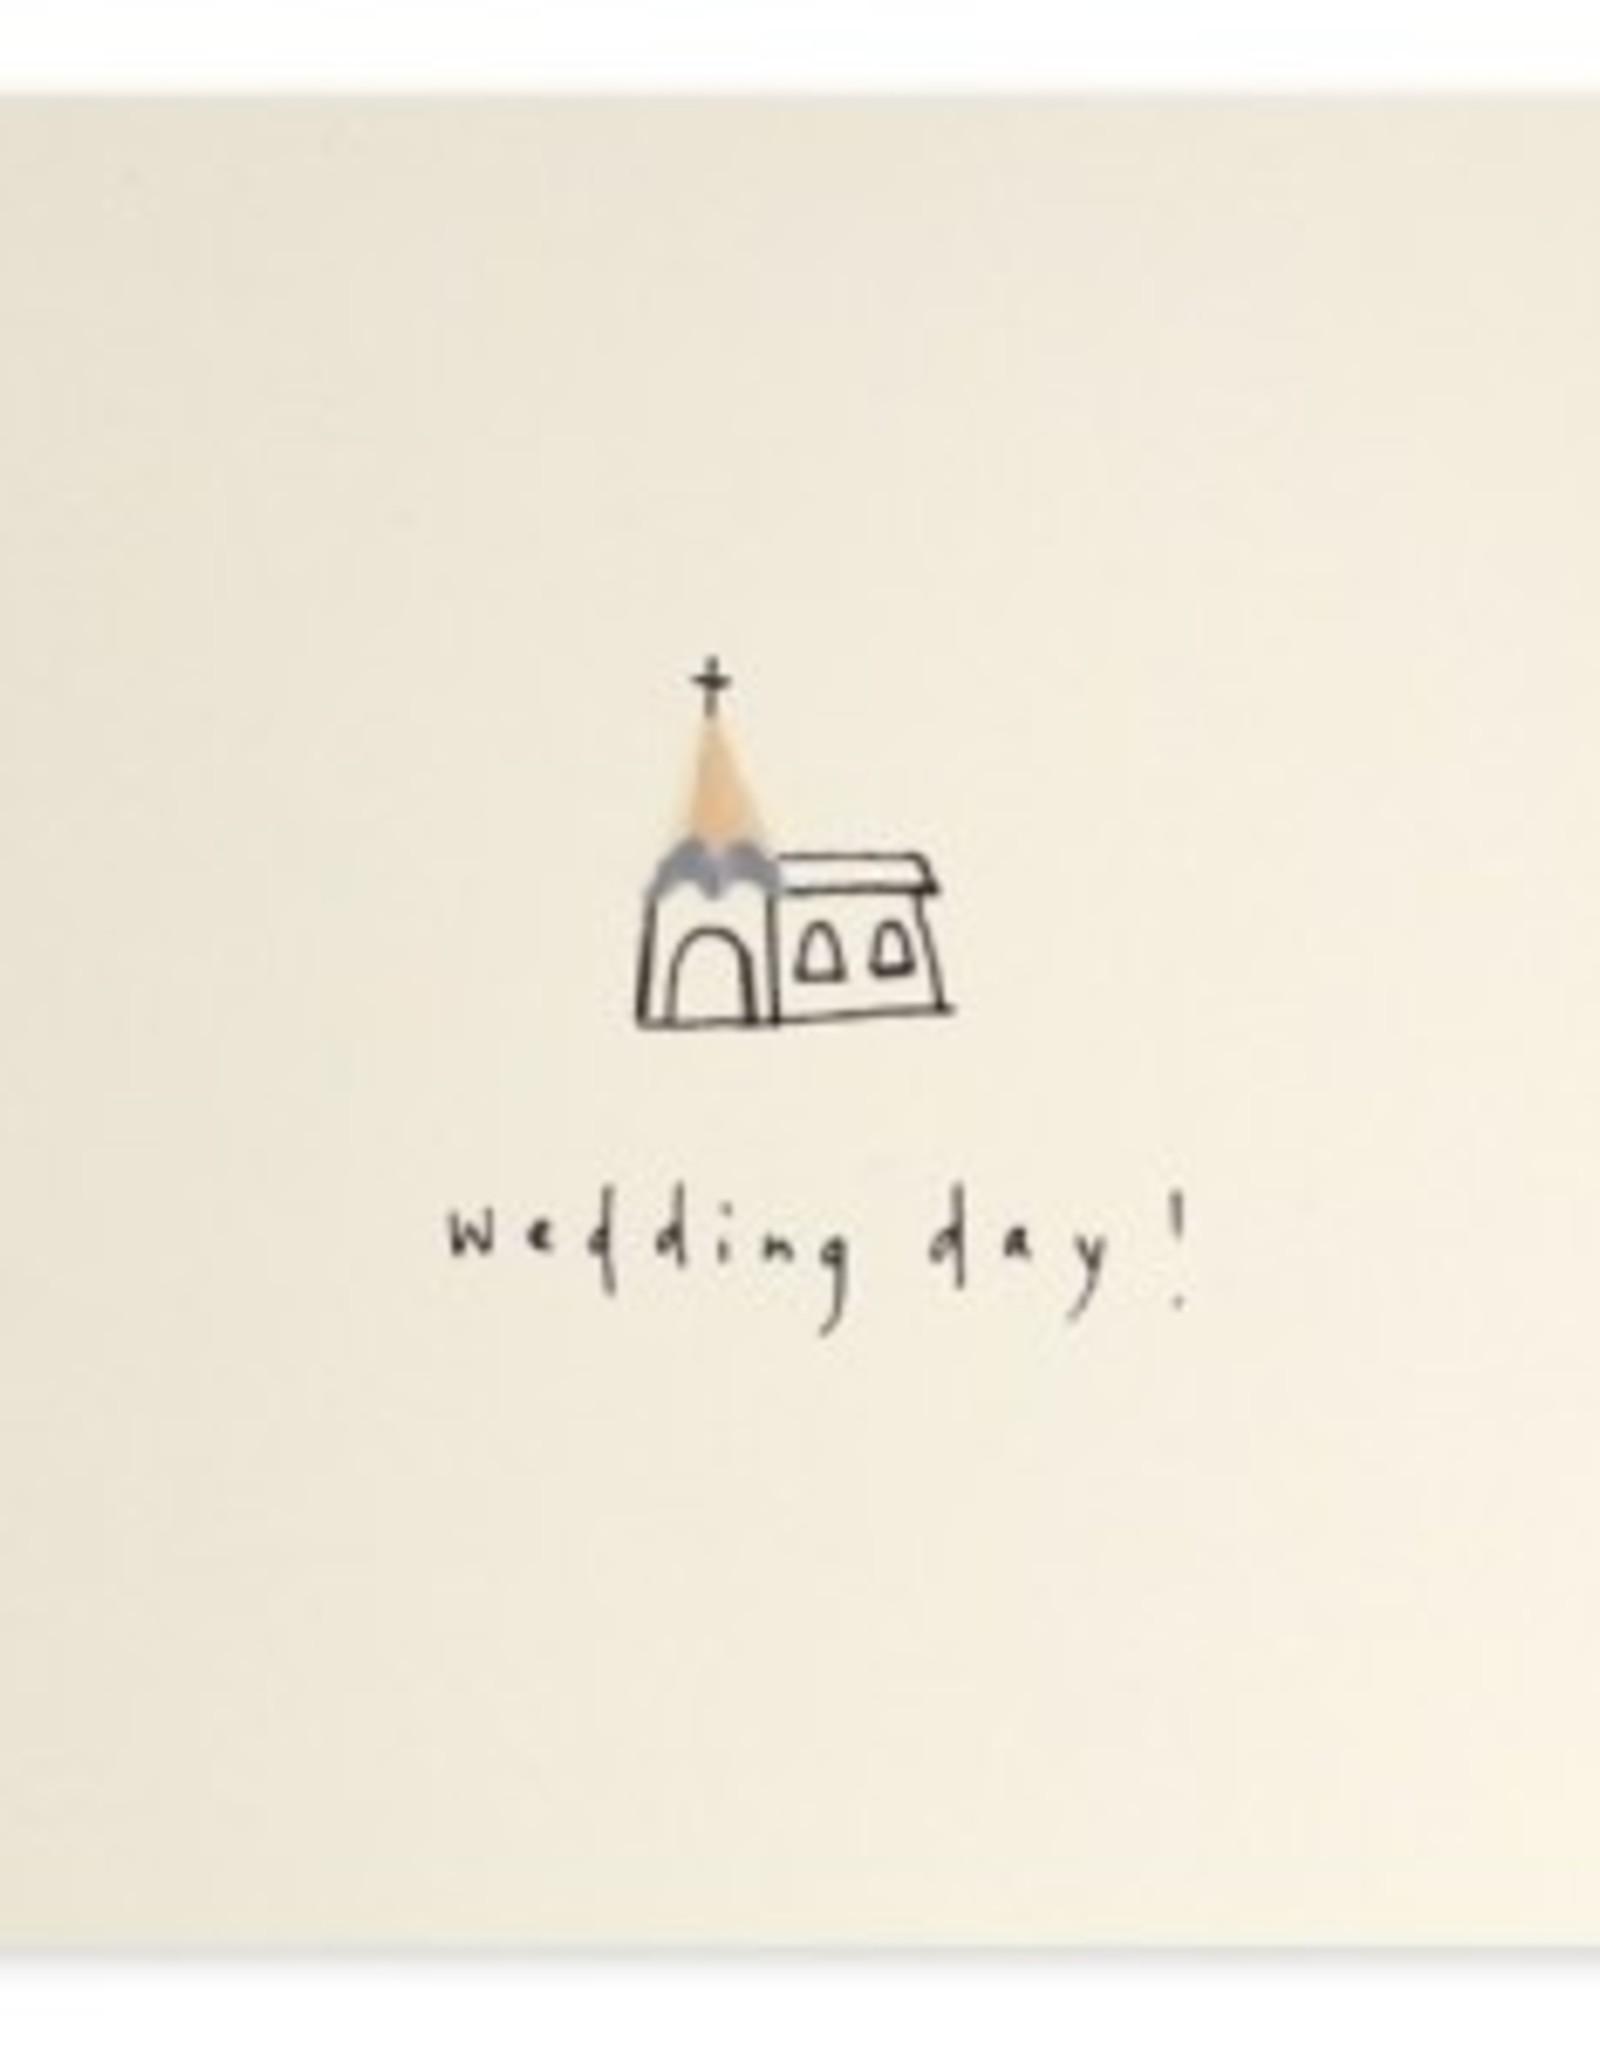 Ruth Jackson wedding day